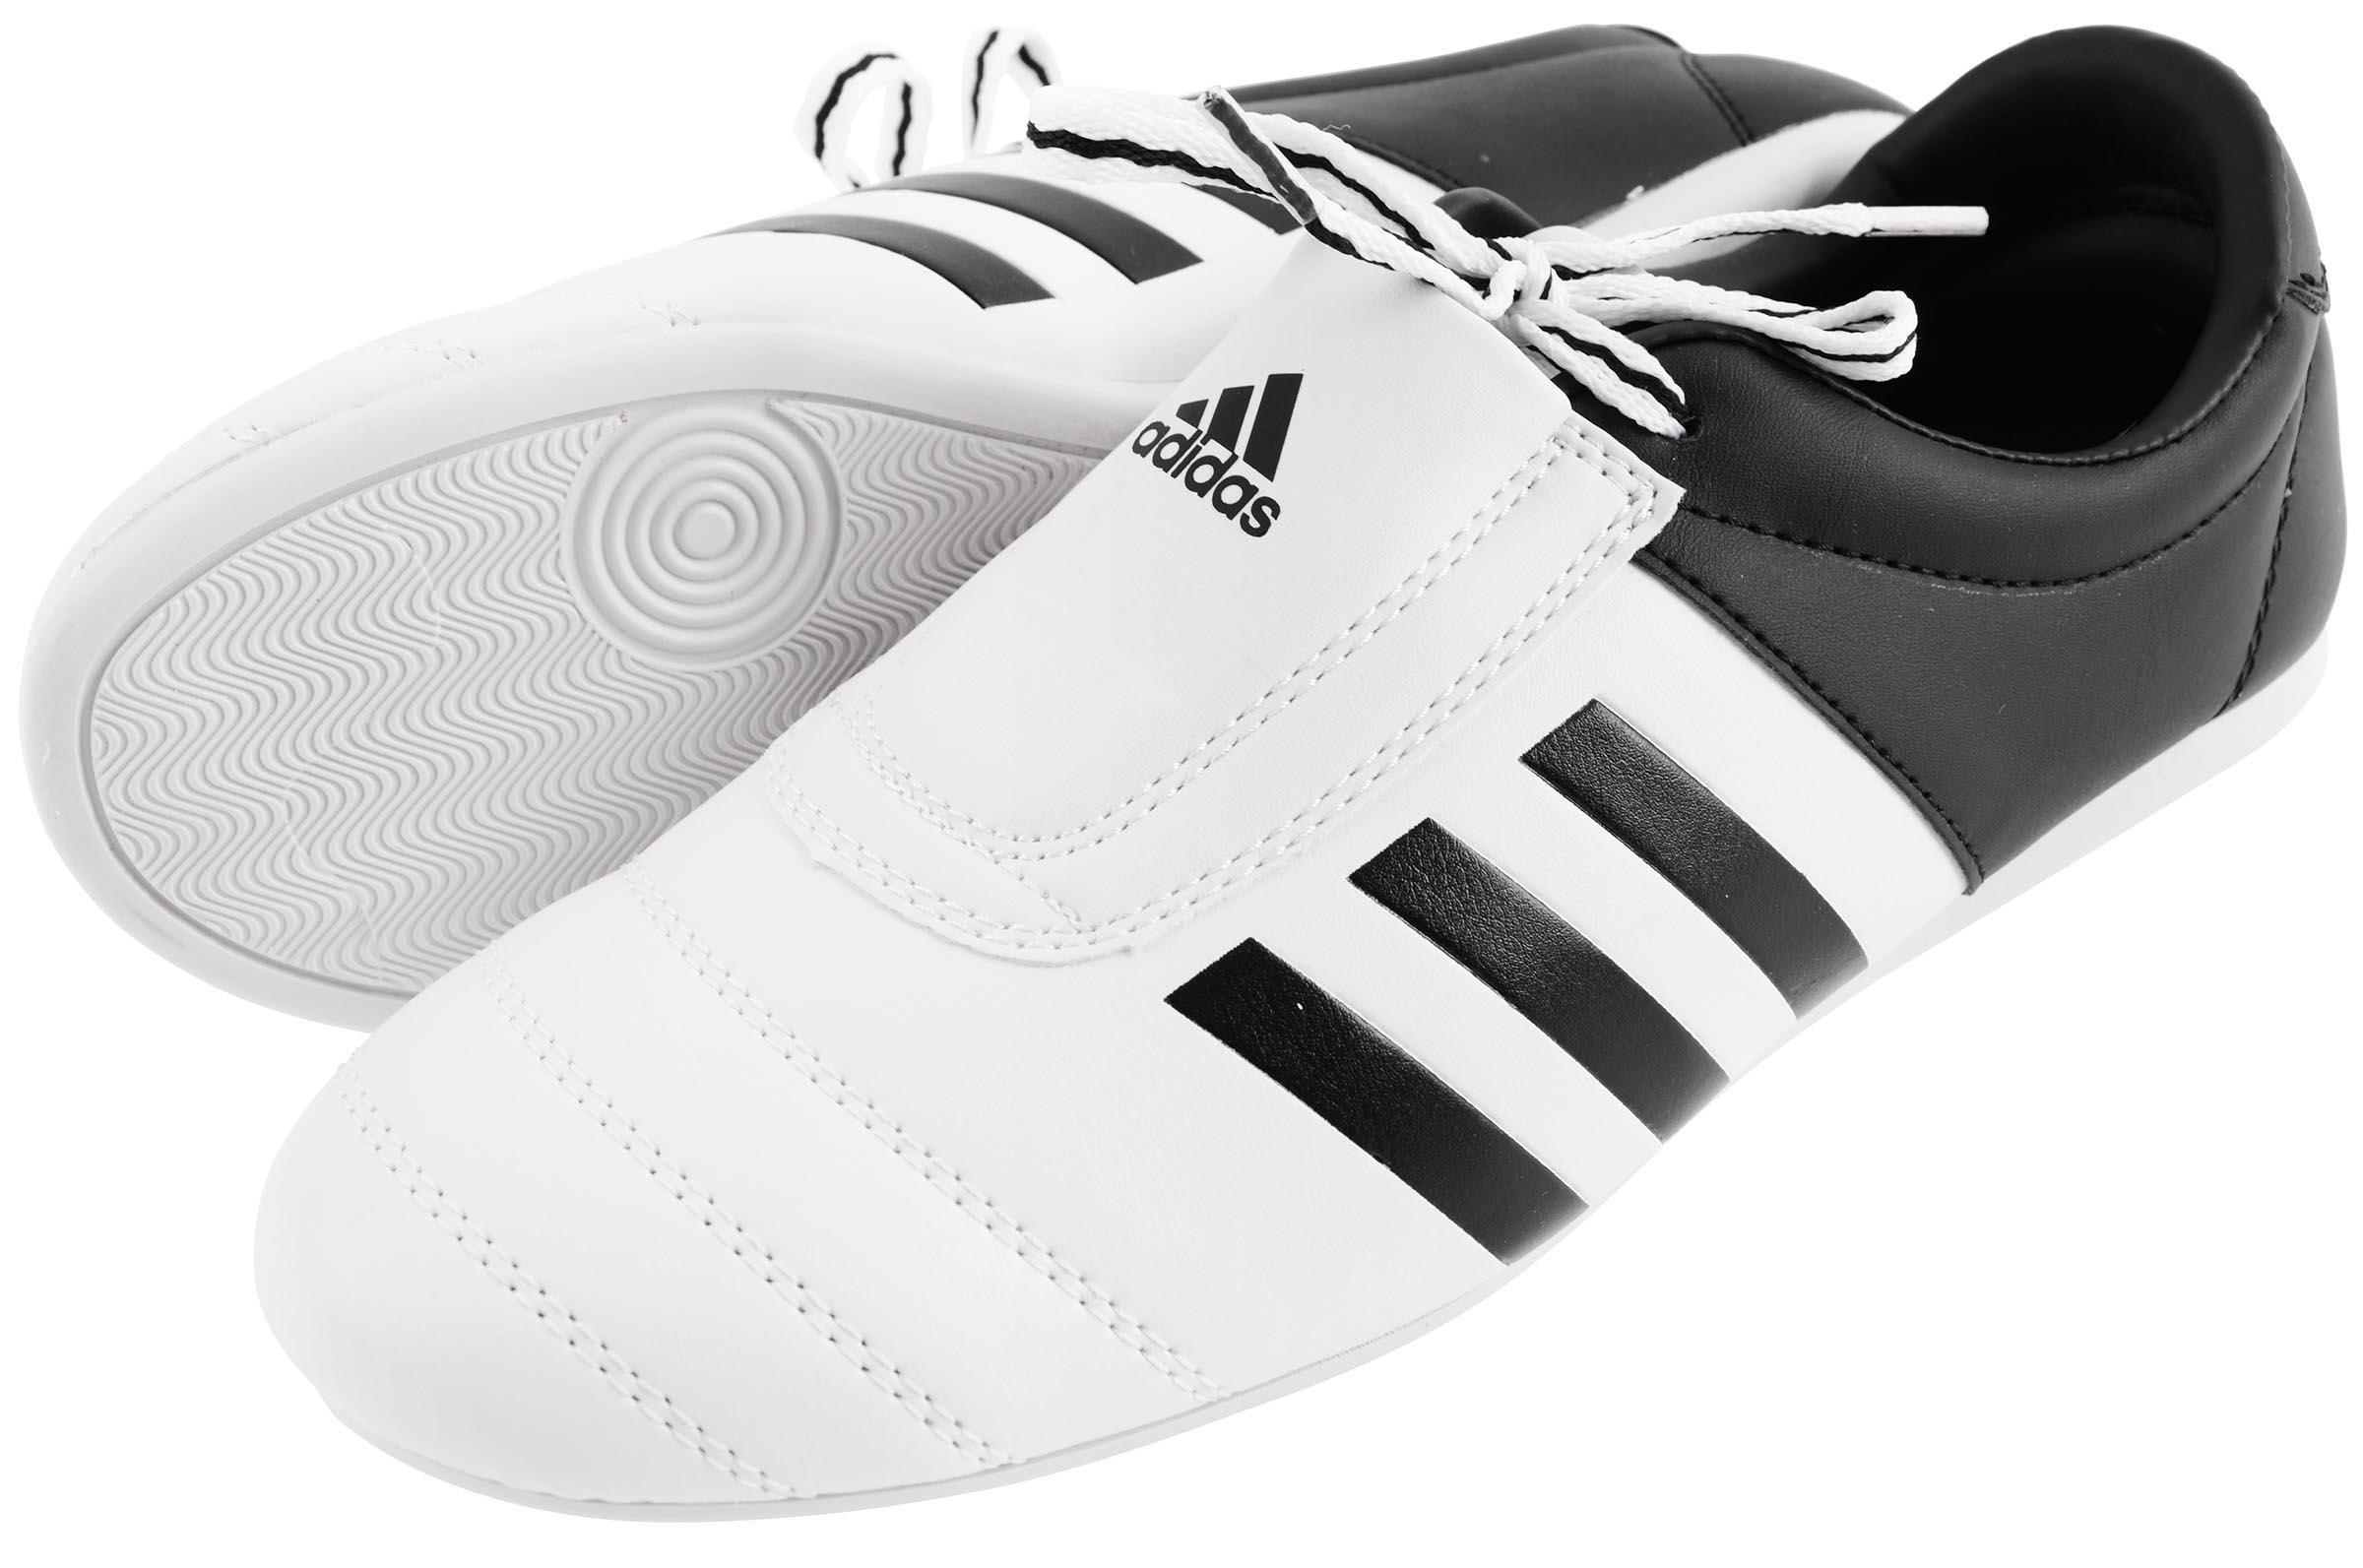 Adidas eu Adikick Aditkk01 Taekwondoschoenen Dragonsports wHFxPCRnq